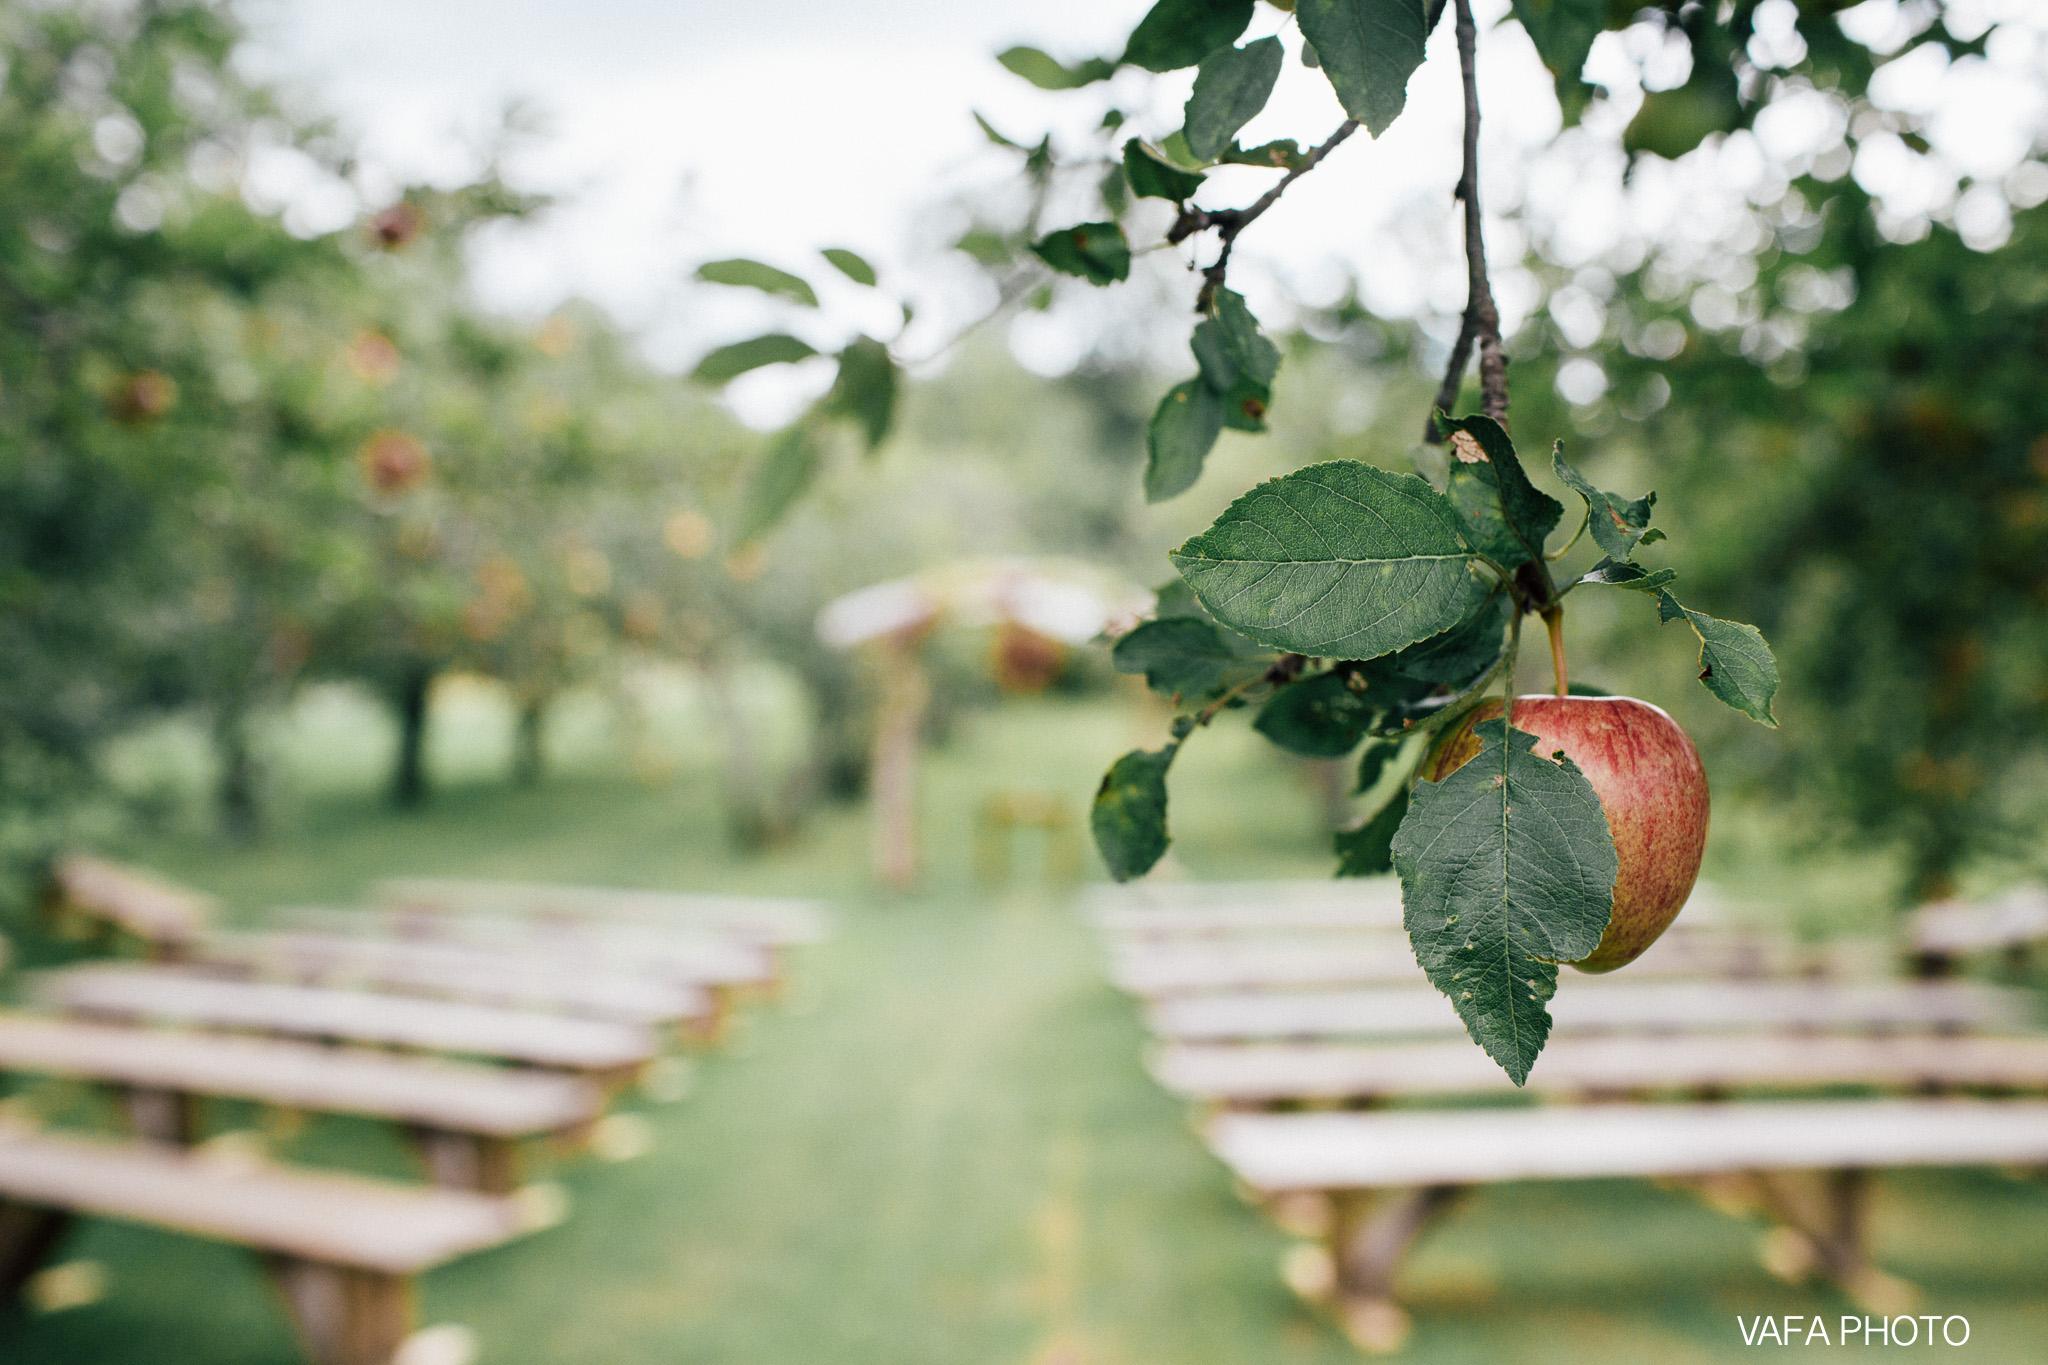 Belsolda-Farm-Wedding-Christy-Eric-Vafa-Photo-352.jpg